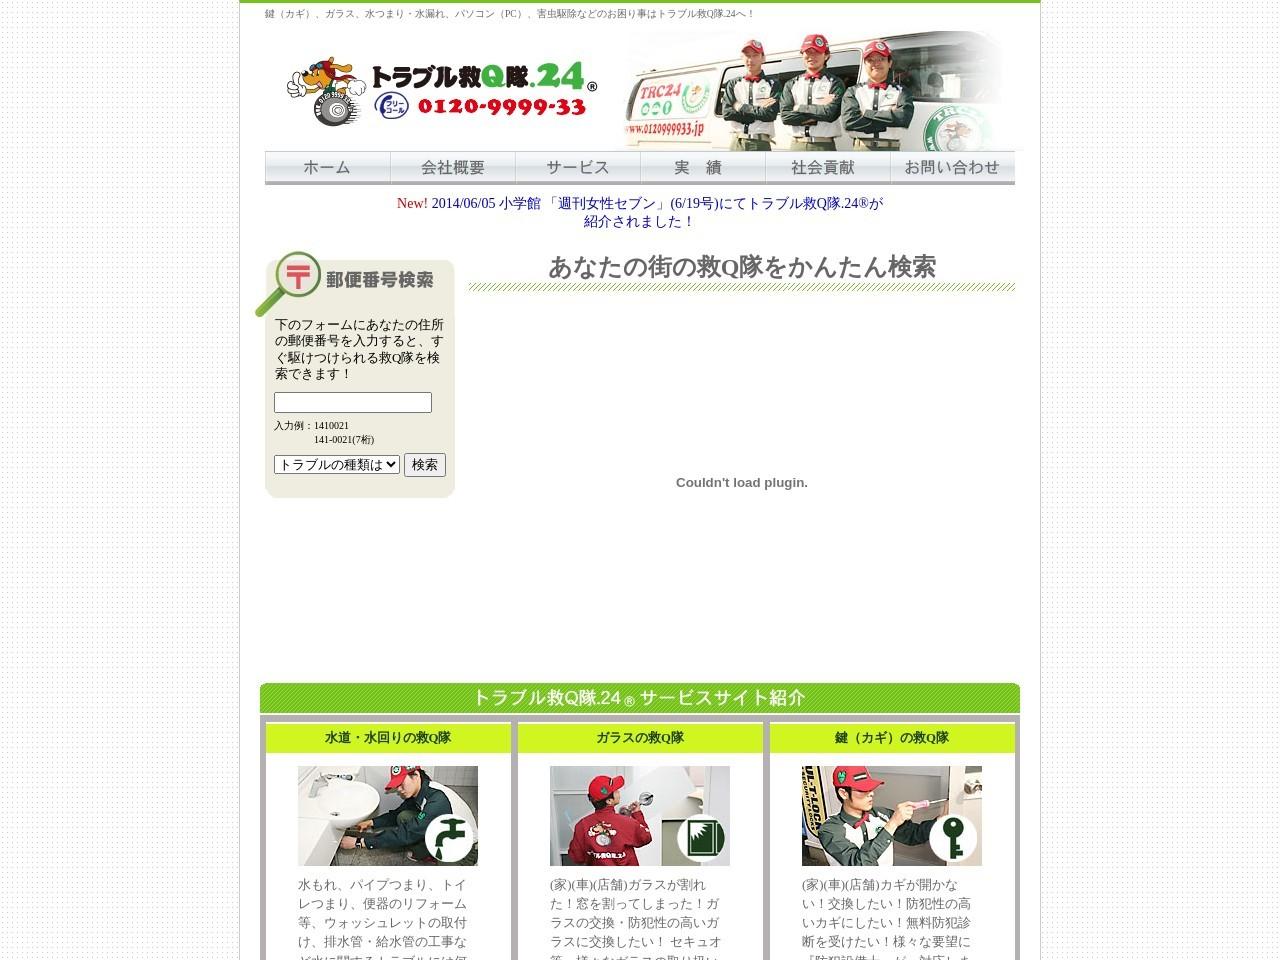 A/足立区・綾瀬駅前・東和・大谷田・六木・加平IC前24時間受付センター